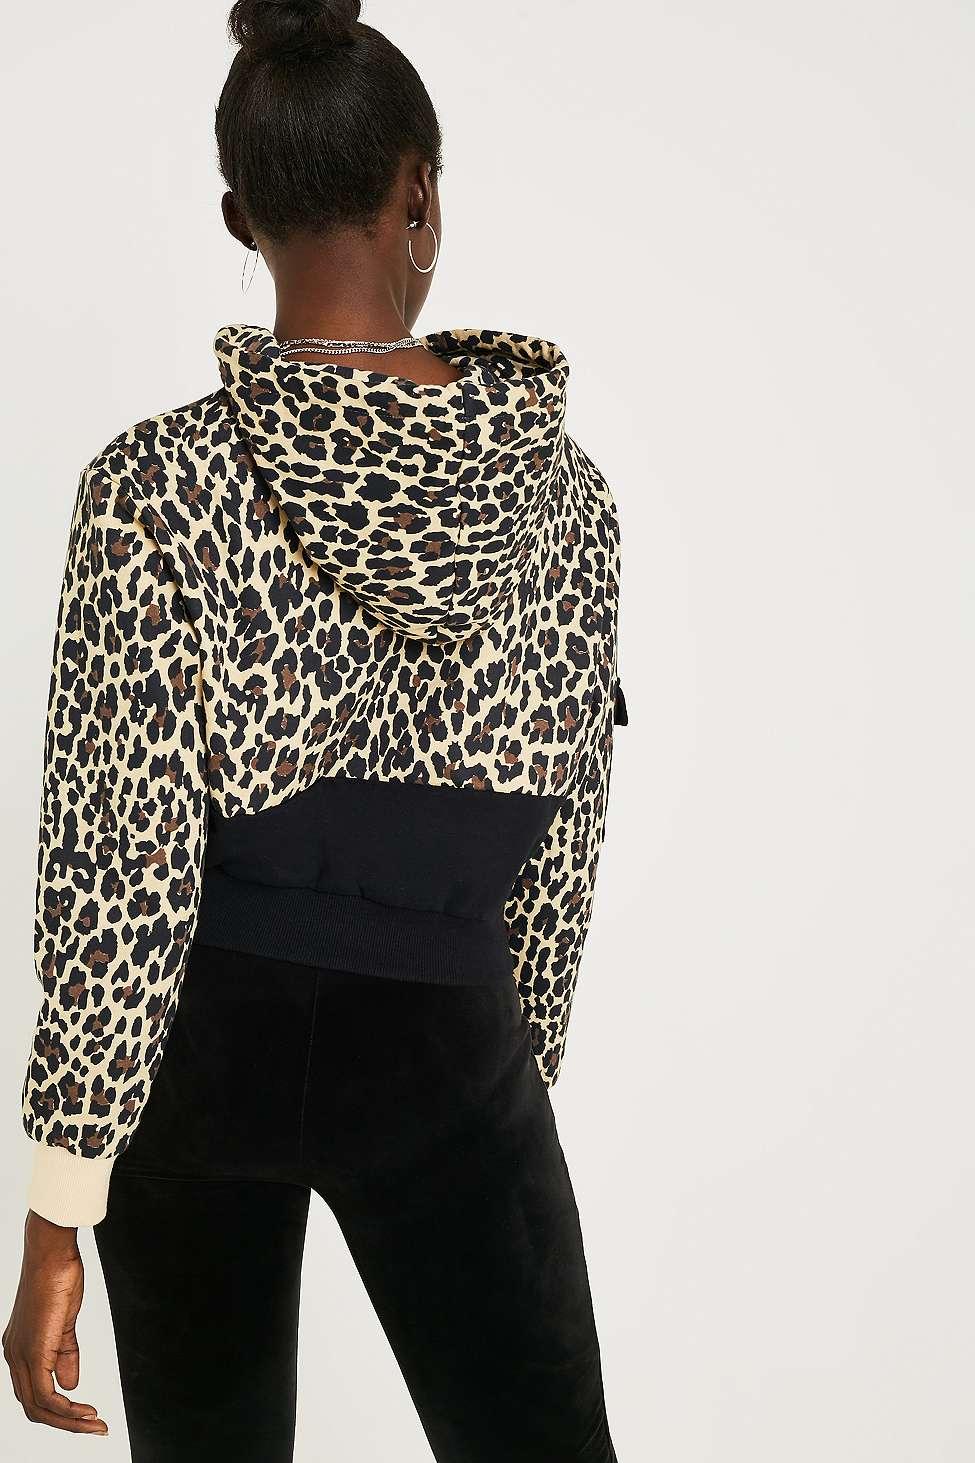 Fila Leopard Print Crop Hoodie by Fila